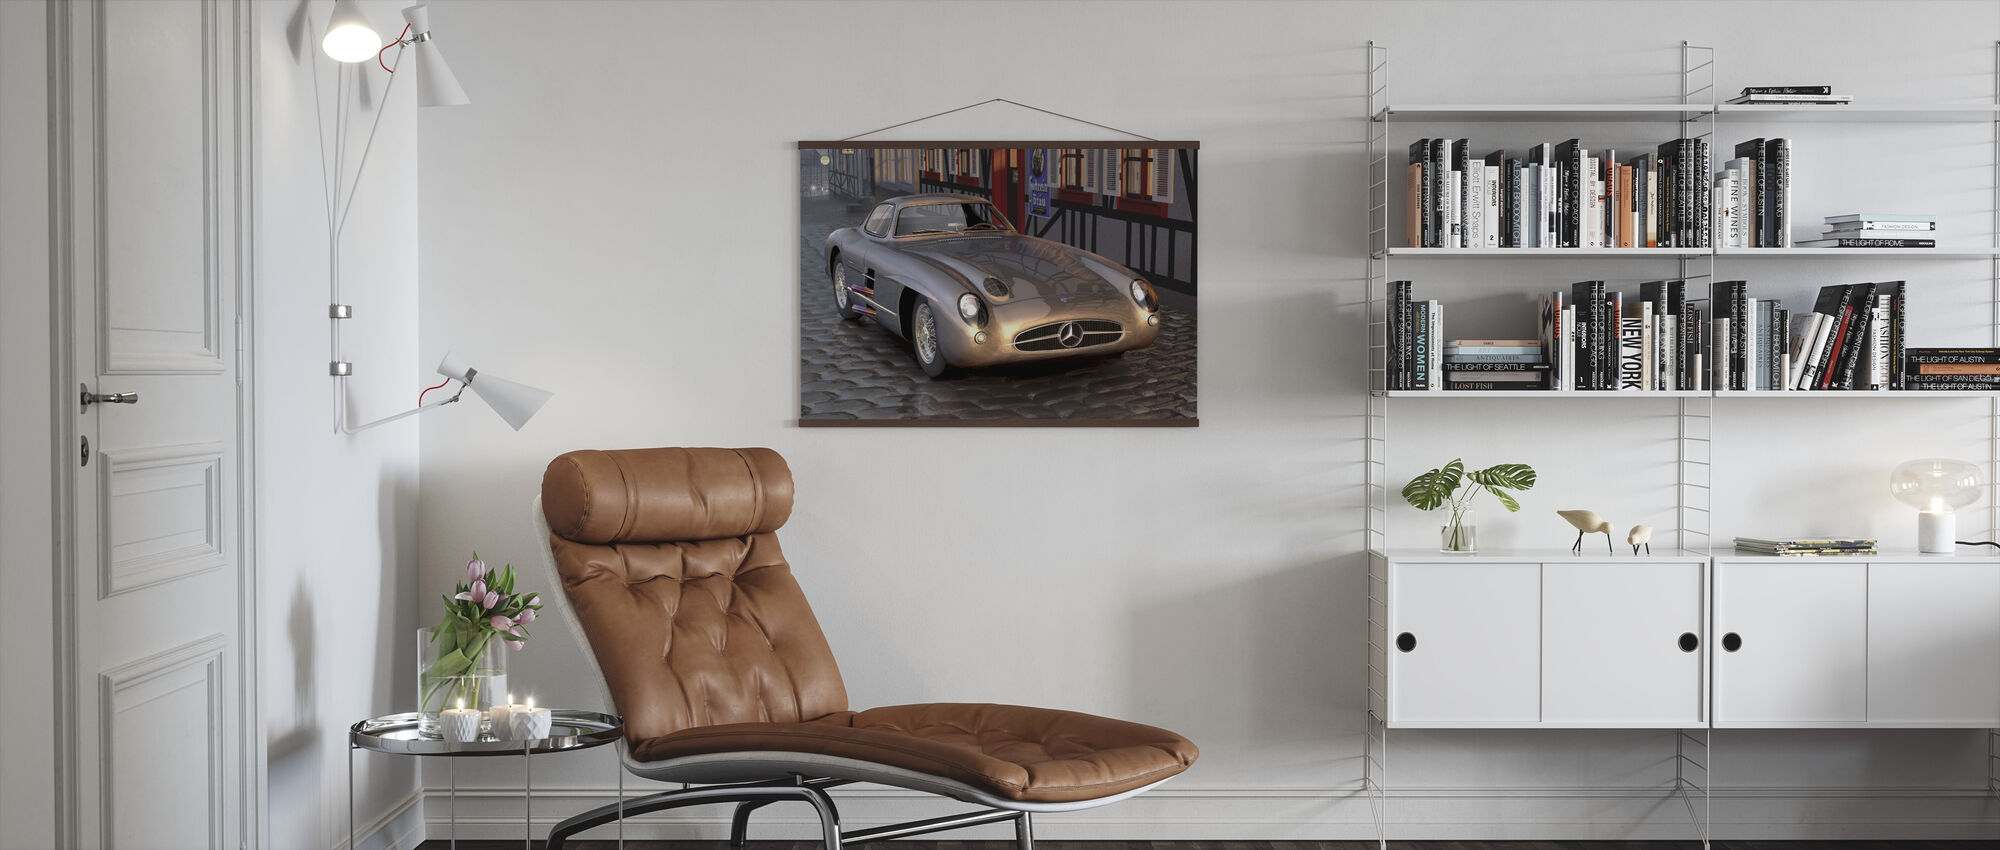 Shiny 300 - Poster - Living Room